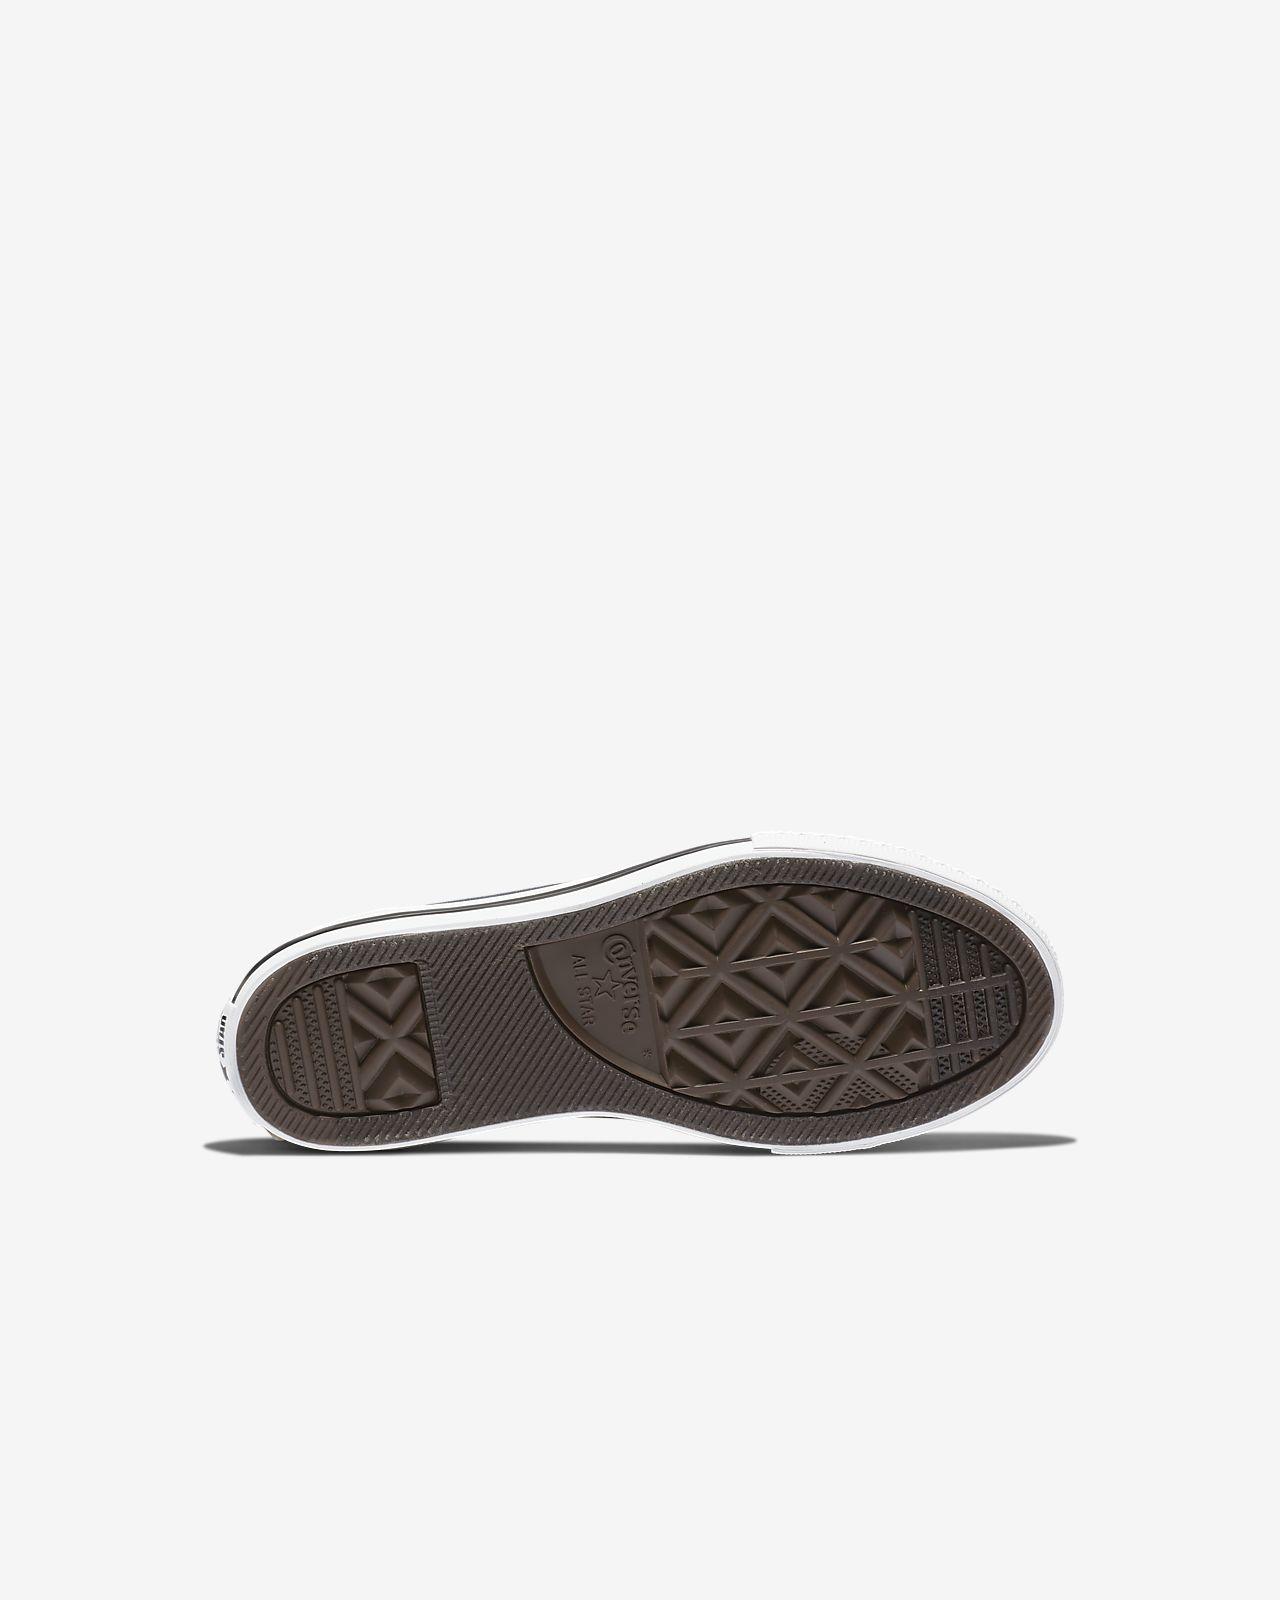 online store e322f 08ea3 Converse Chuck Taylor All Star Low Top (10.5c-3y) Little Kids' Shoe